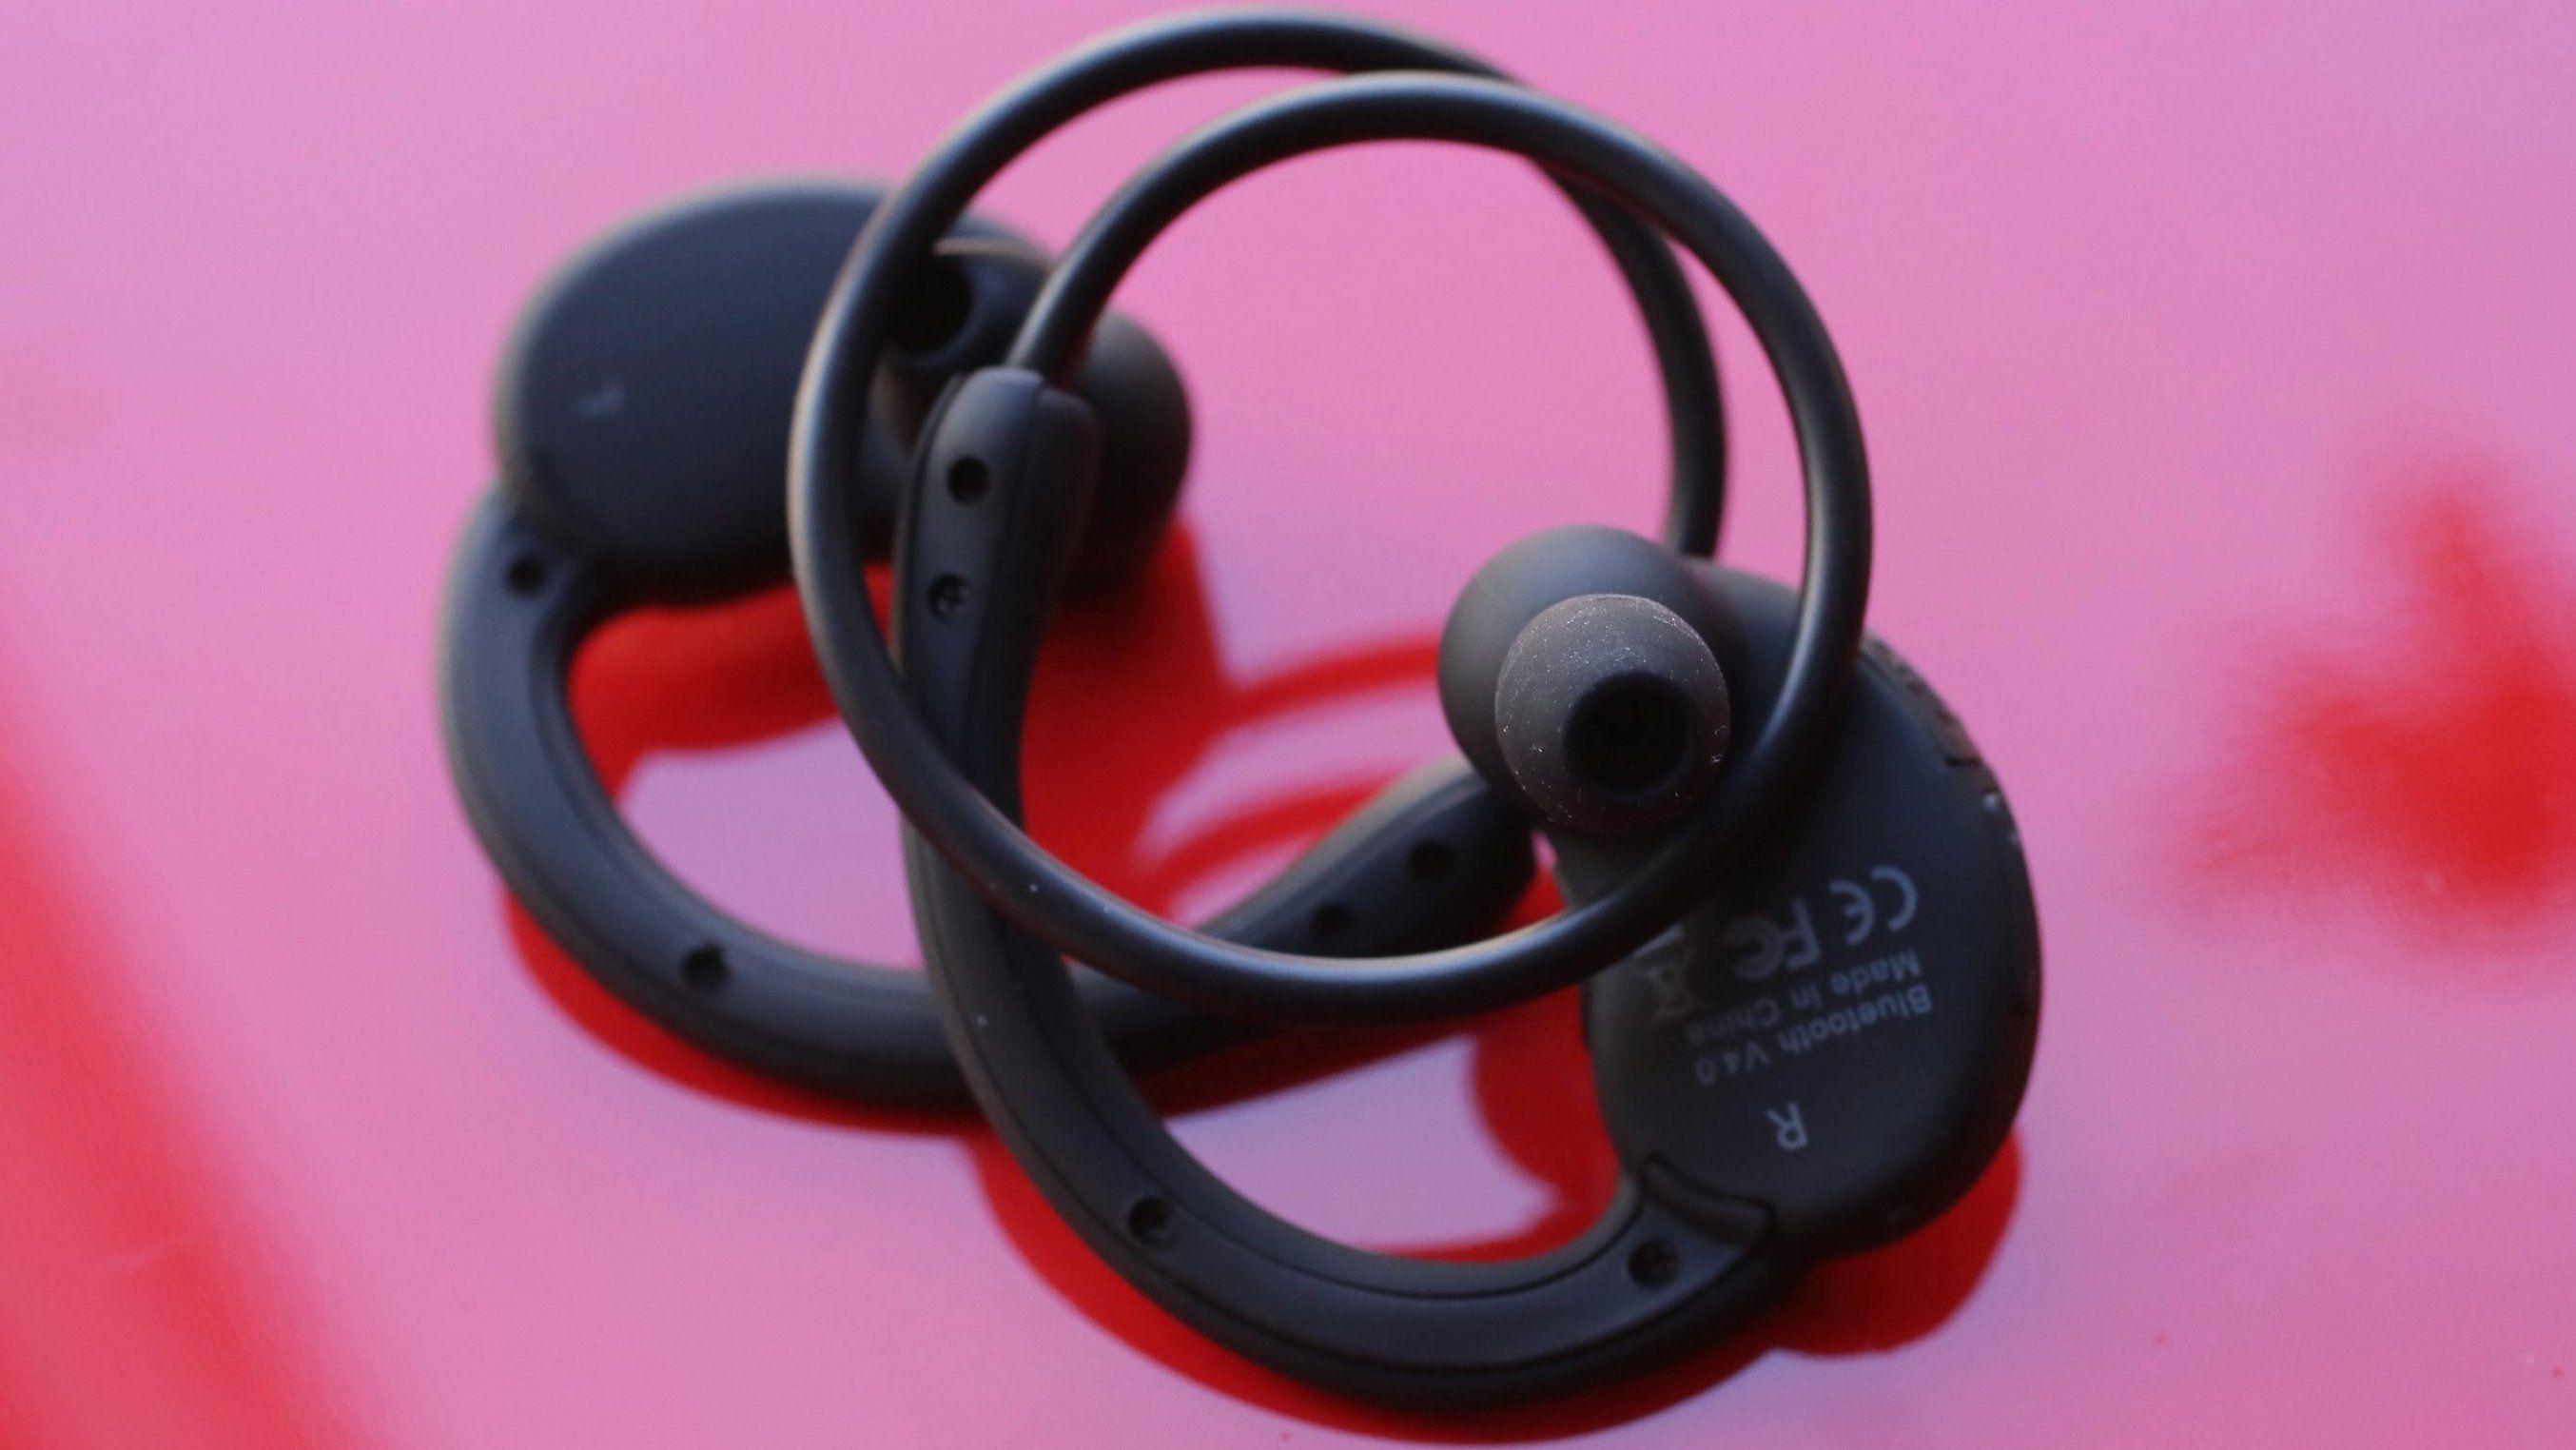 Mpow Cheetah Bluetooth Sports headphones review